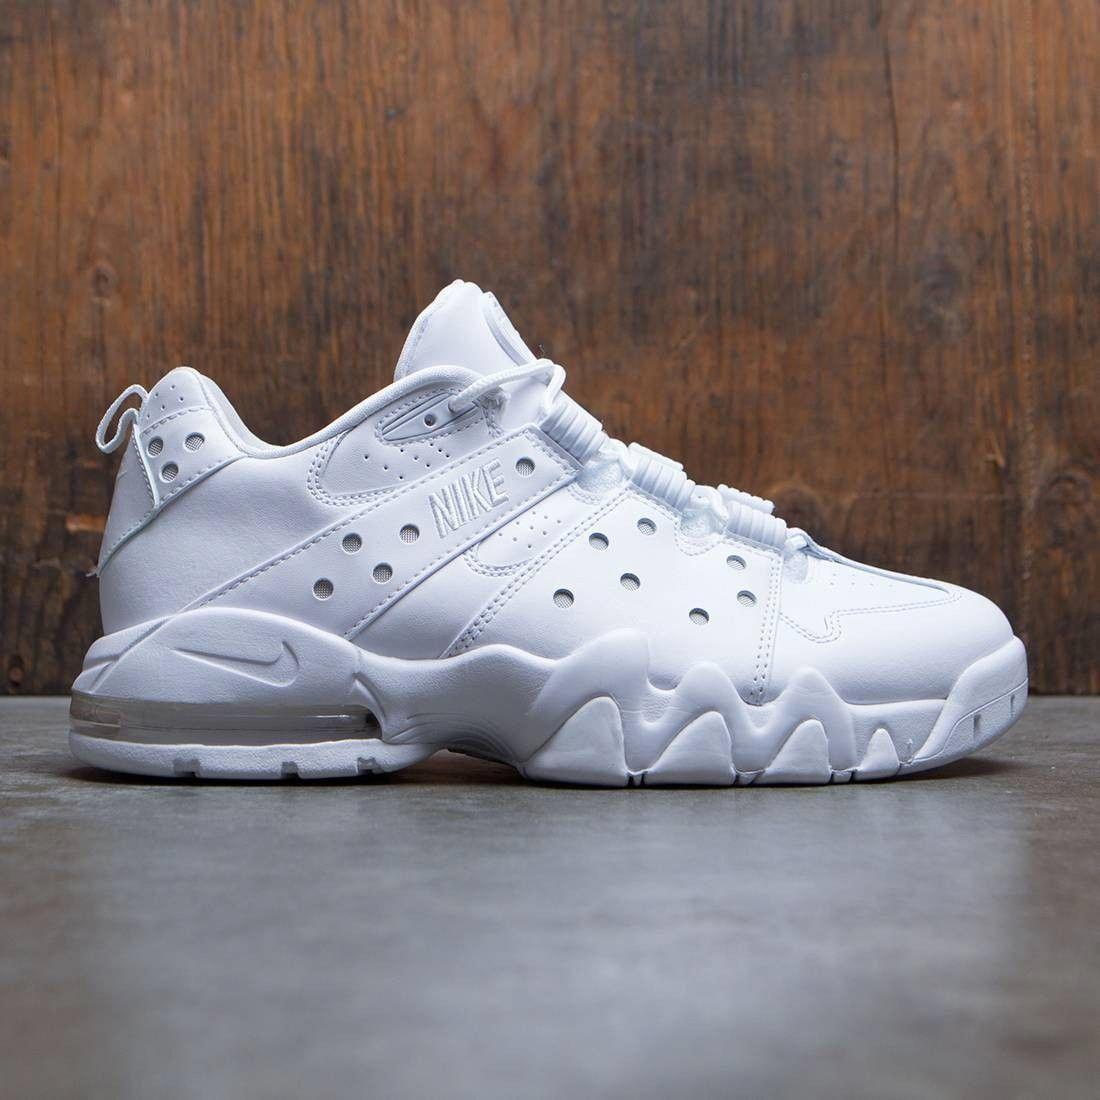 e8114332d5 nike men air max cb '94 low white white white #MensFashionSneakers ...